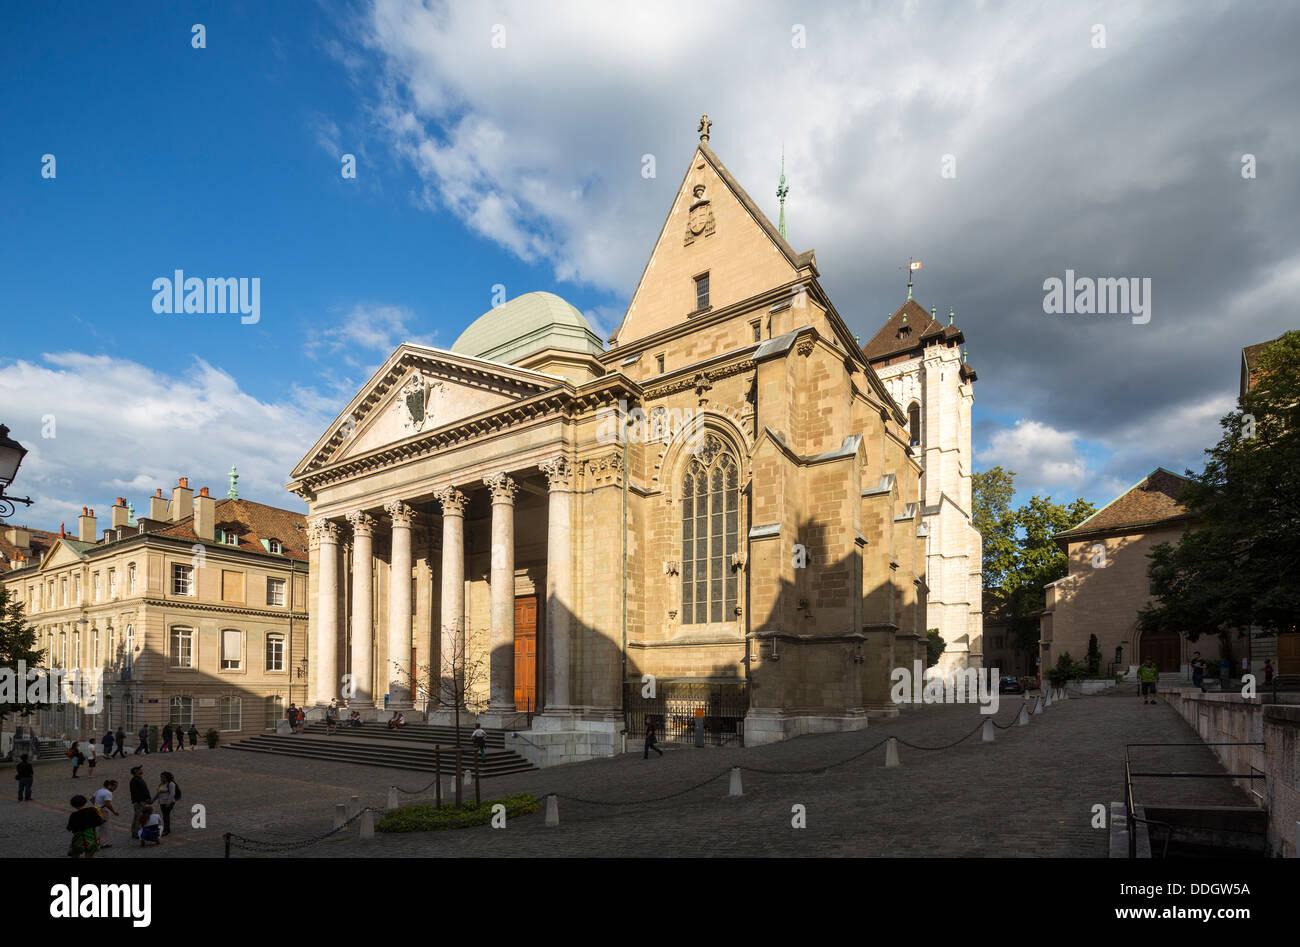 exterior of St. Pierre Cathedral, Geneva, Switzerland - Stock Image